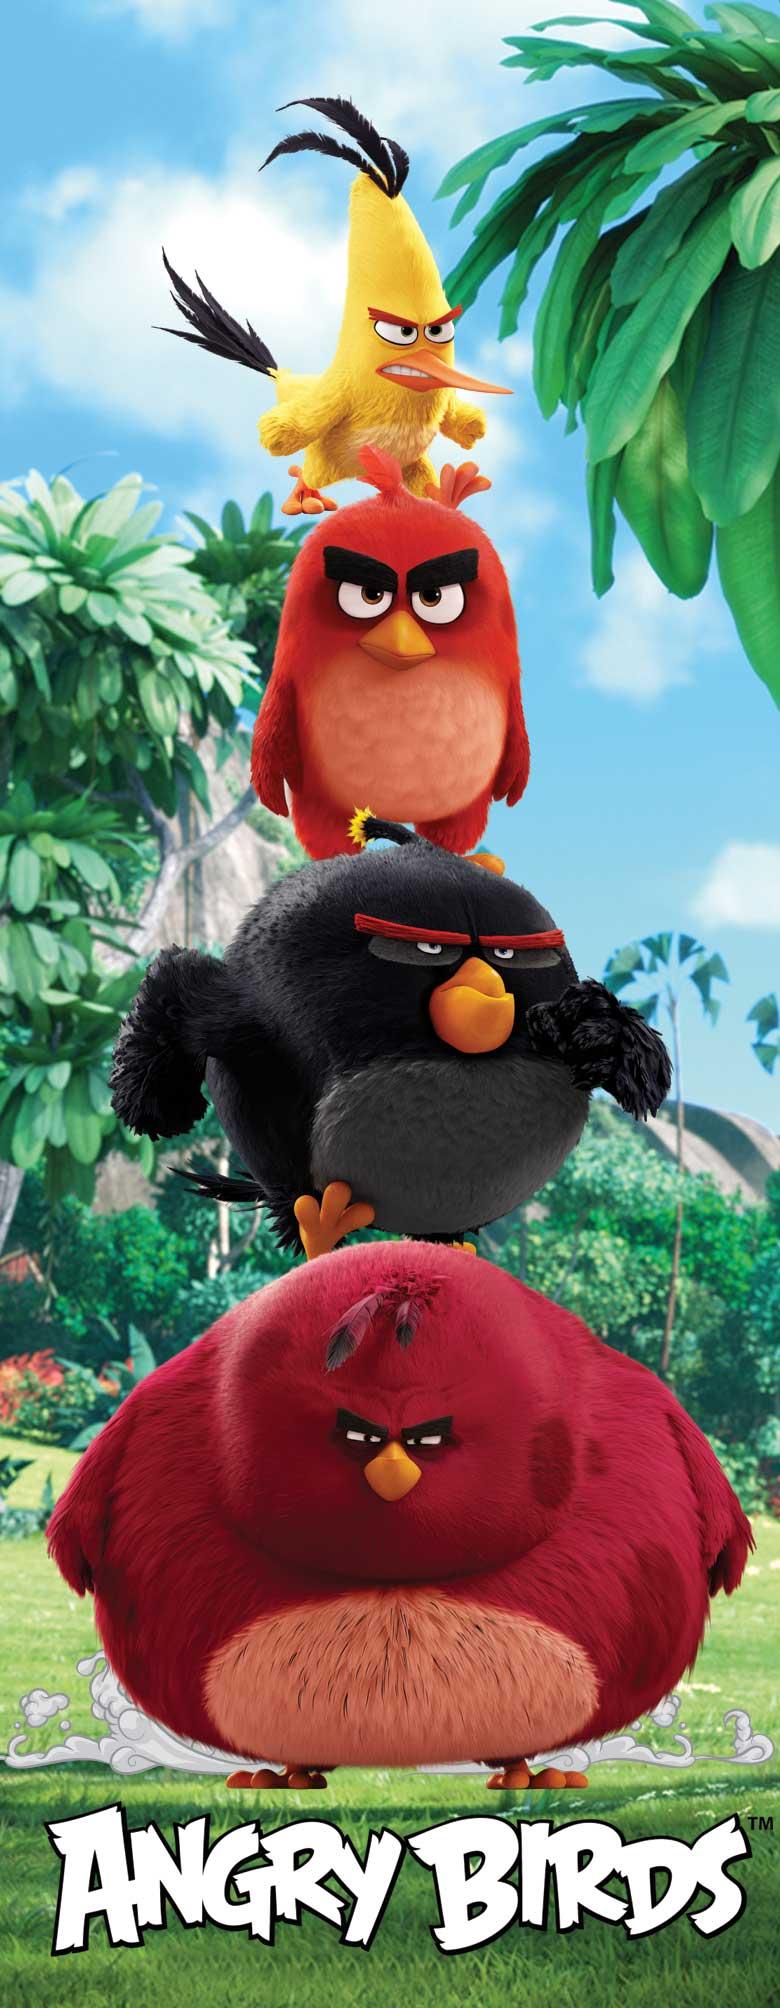 BO_angrybirds